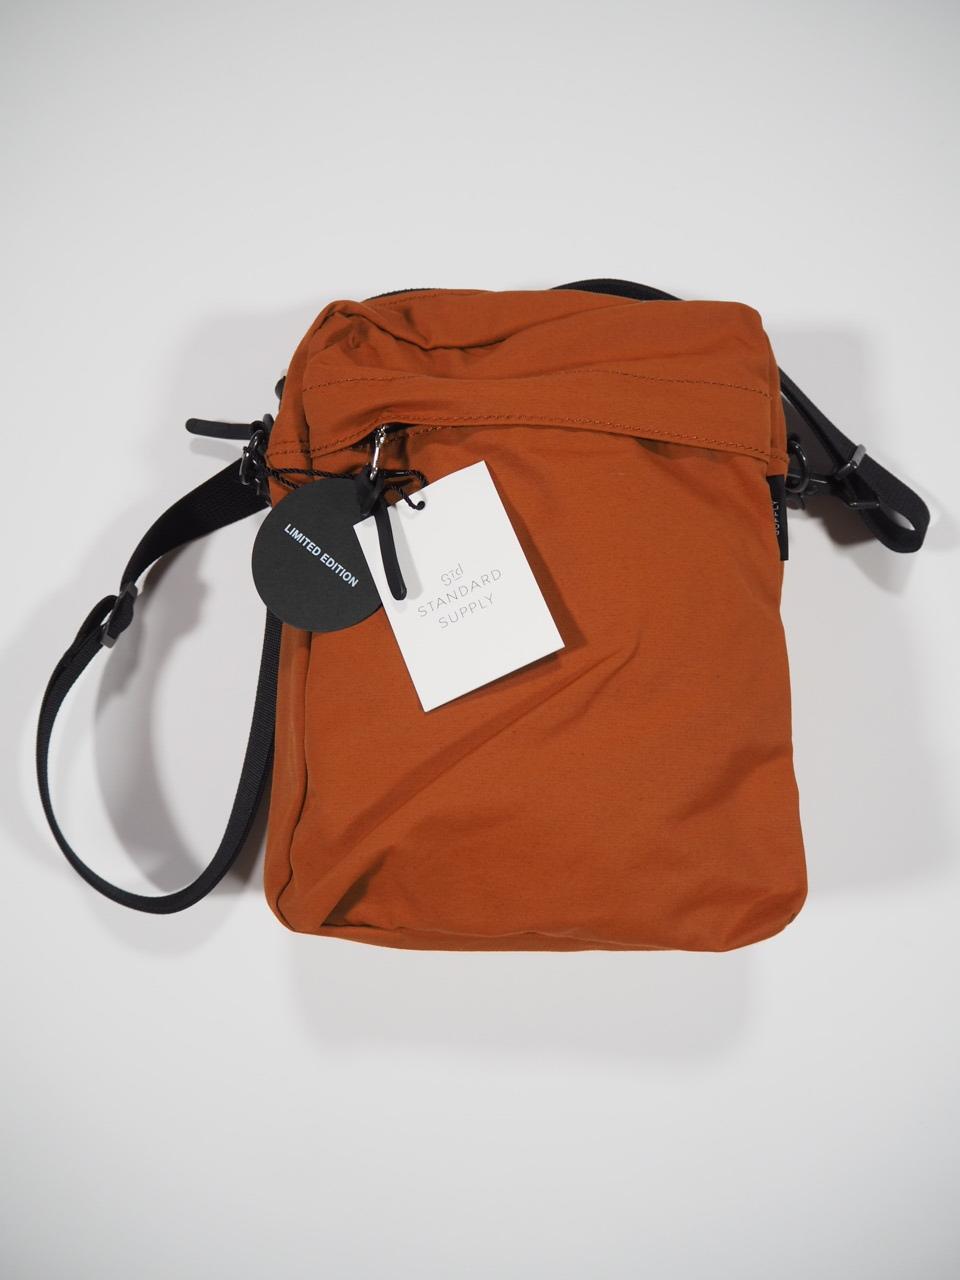 NEW WEEKEND shoulder bag_e0357389_16342041.jpg